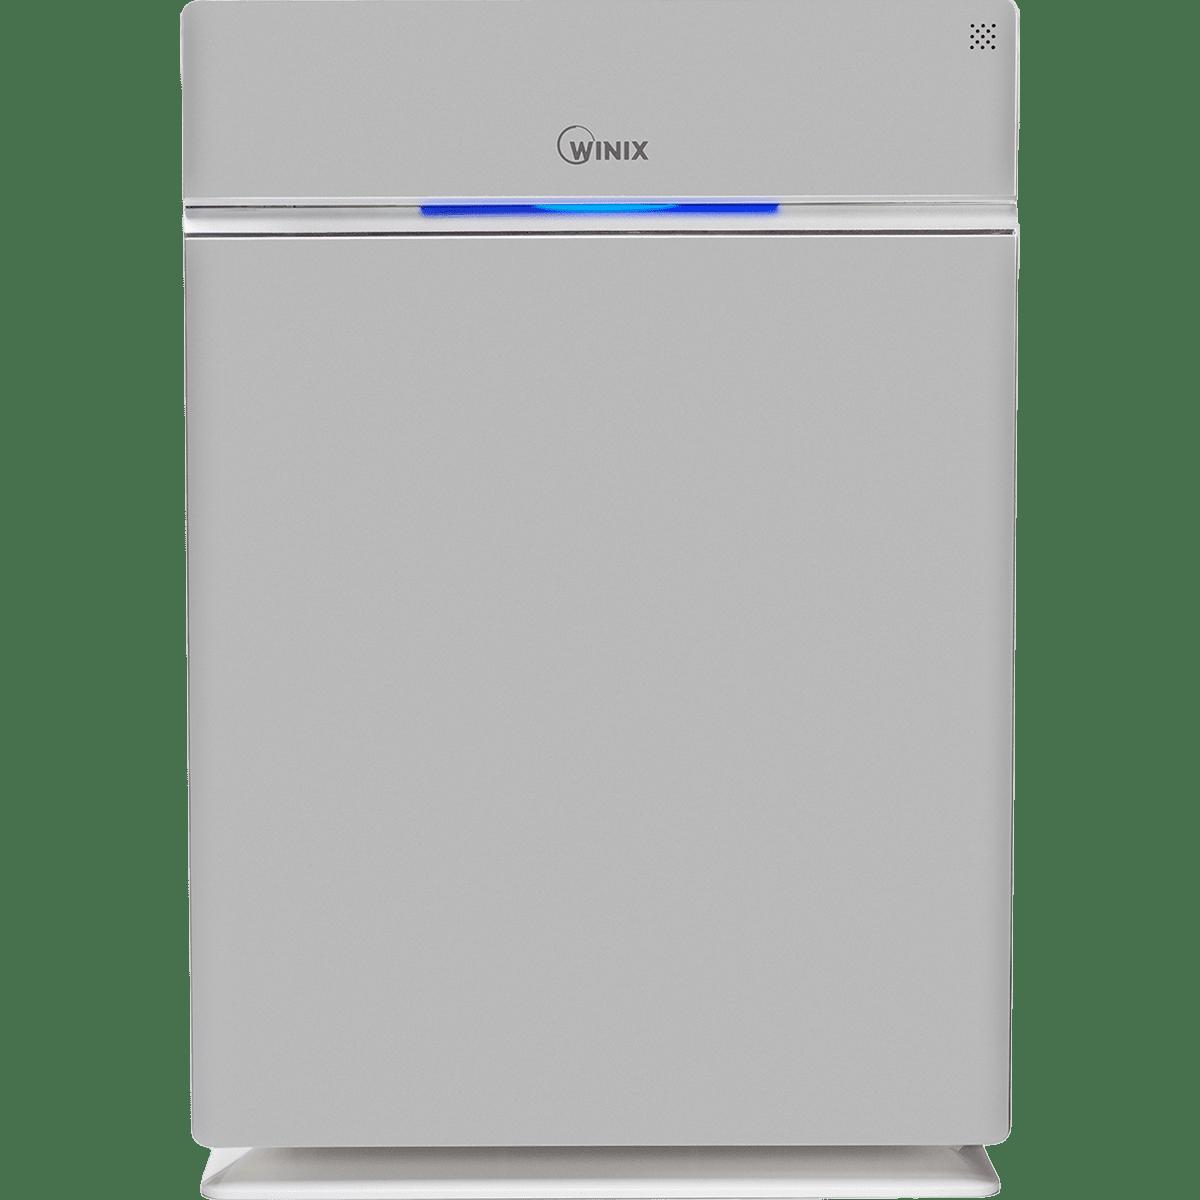 Winix PlasmaWave HR1000 True HEPA WiFi-Connected Smart Air Purifier wi5431